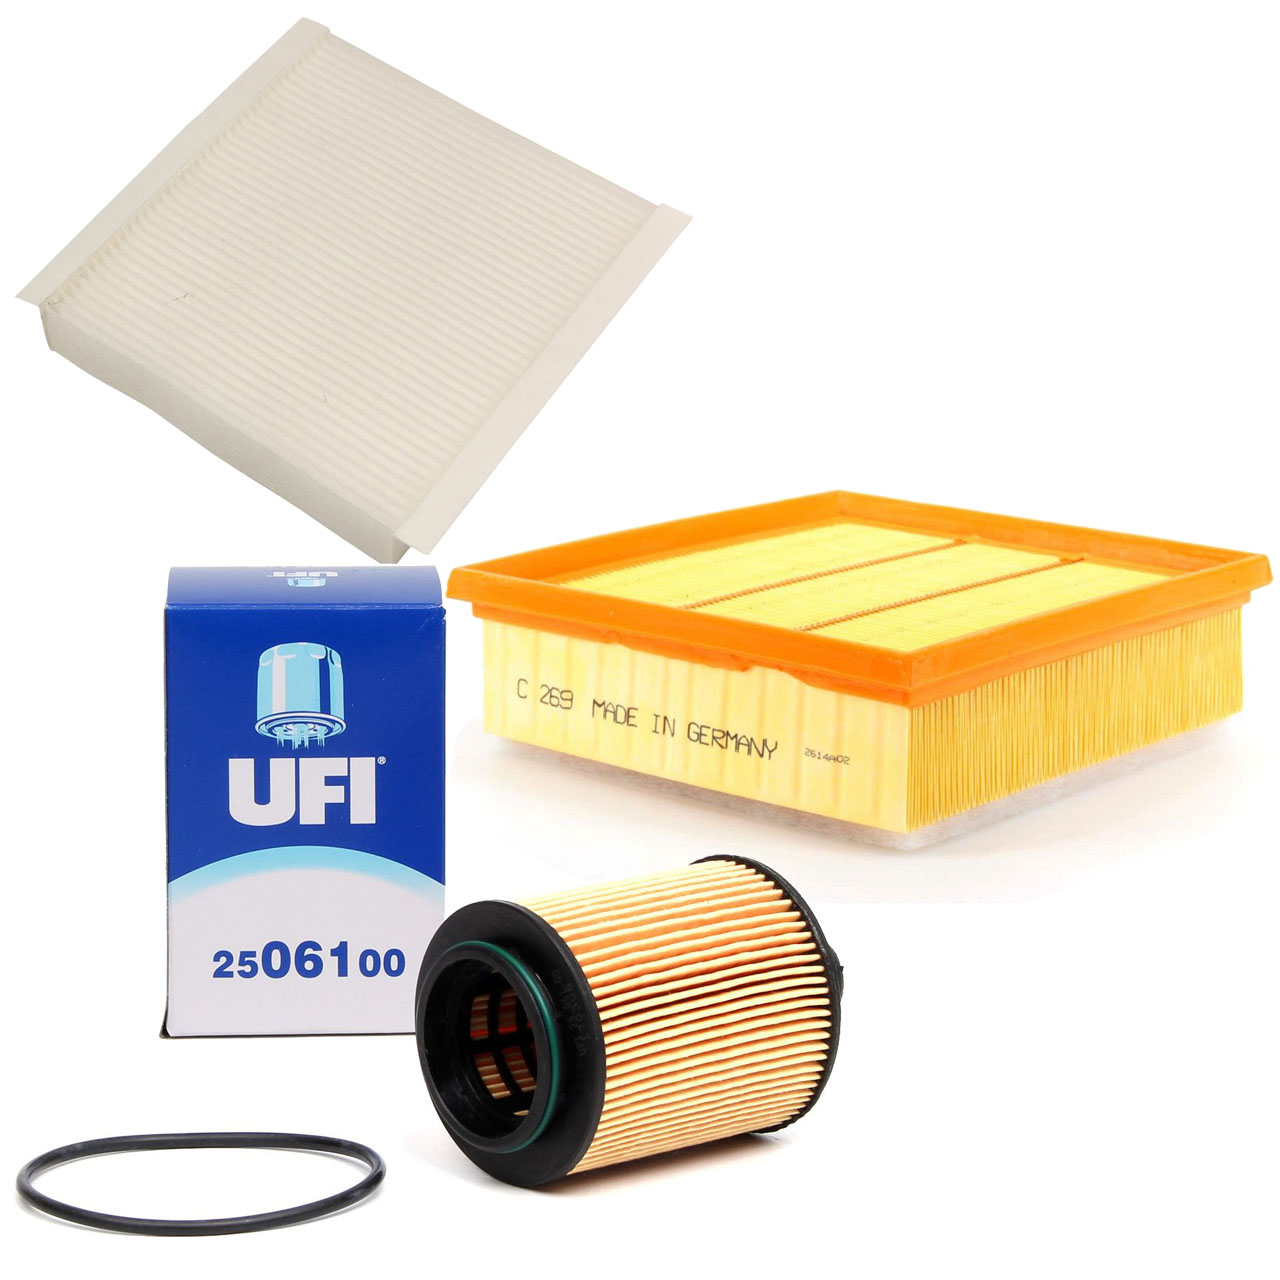 Inspektionskit Filterpaket Filterset für Fiat Doblo Linea 1.6D Multijet 90-105PS